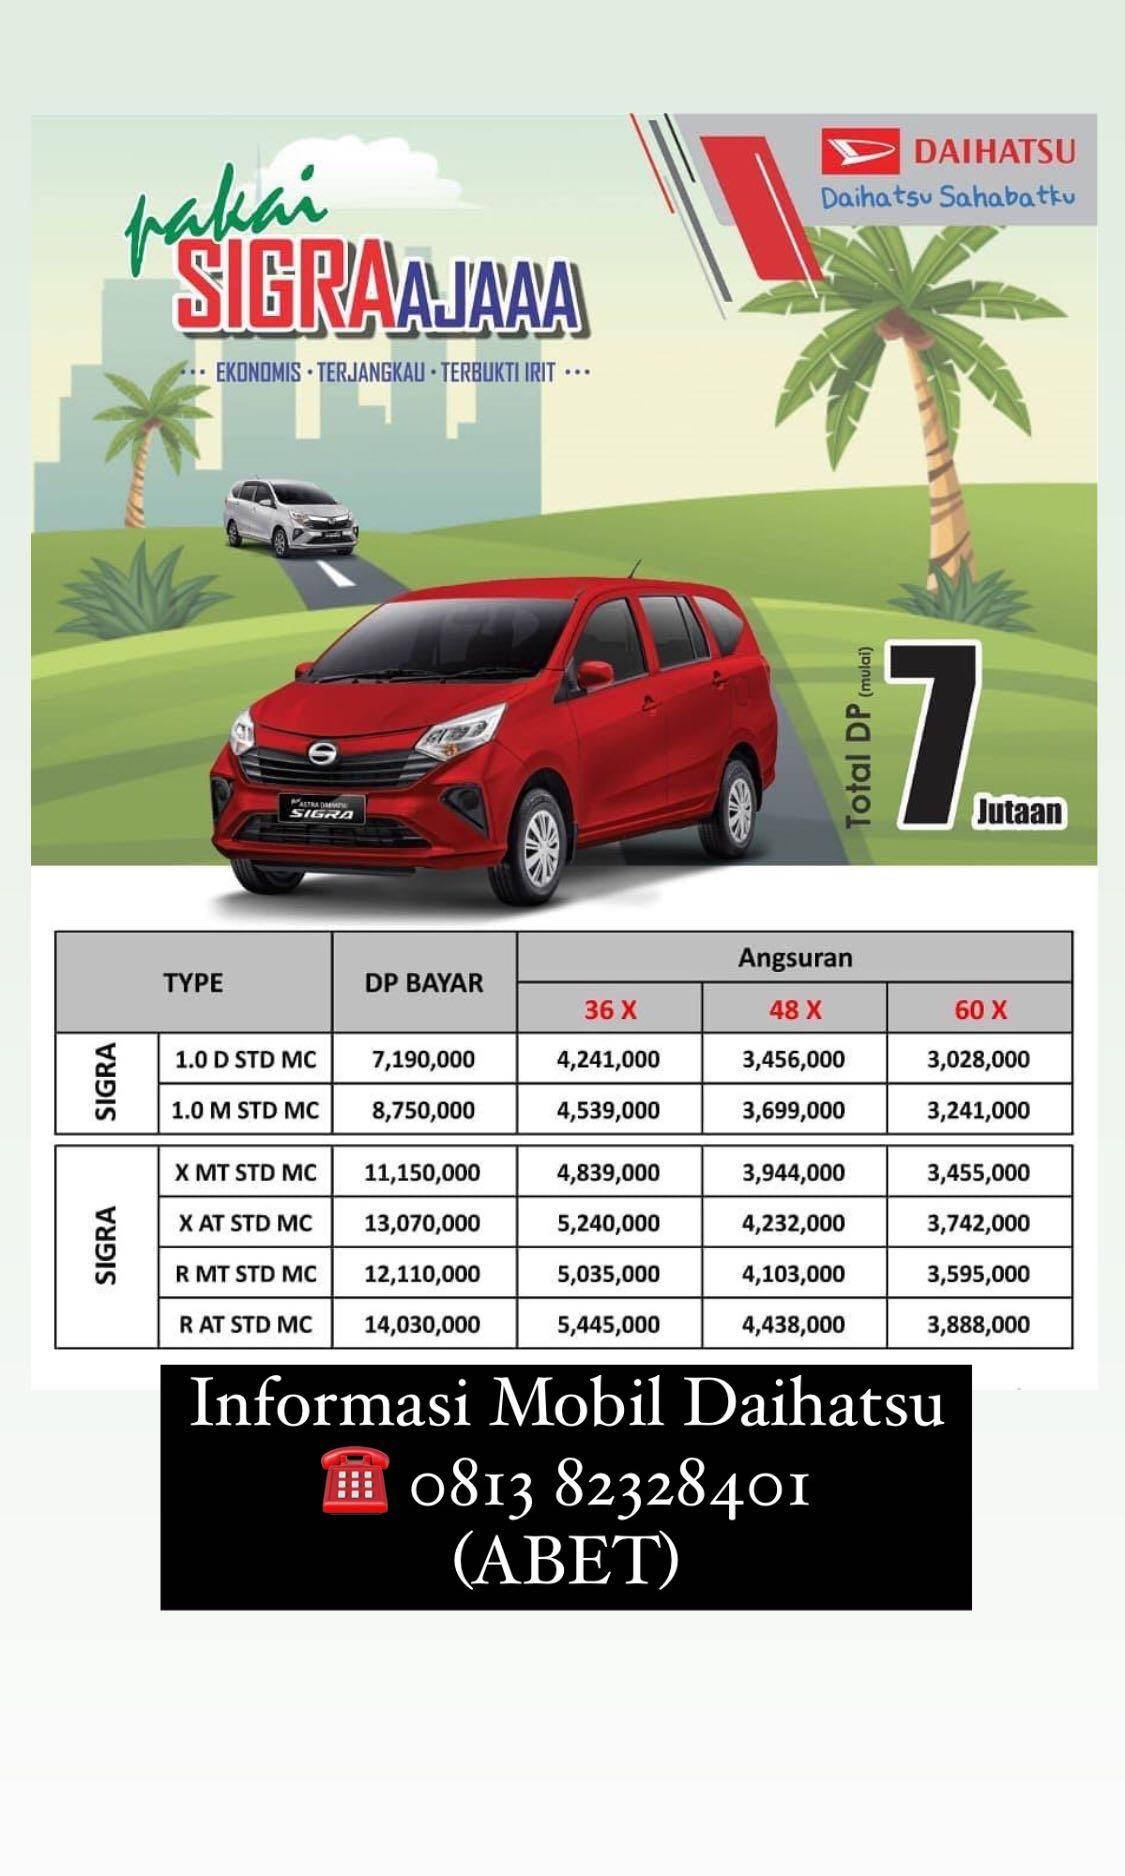 DP MURAH Daihatsu Sigra mulai 7 jutaan. Daihatsu Fatmawati